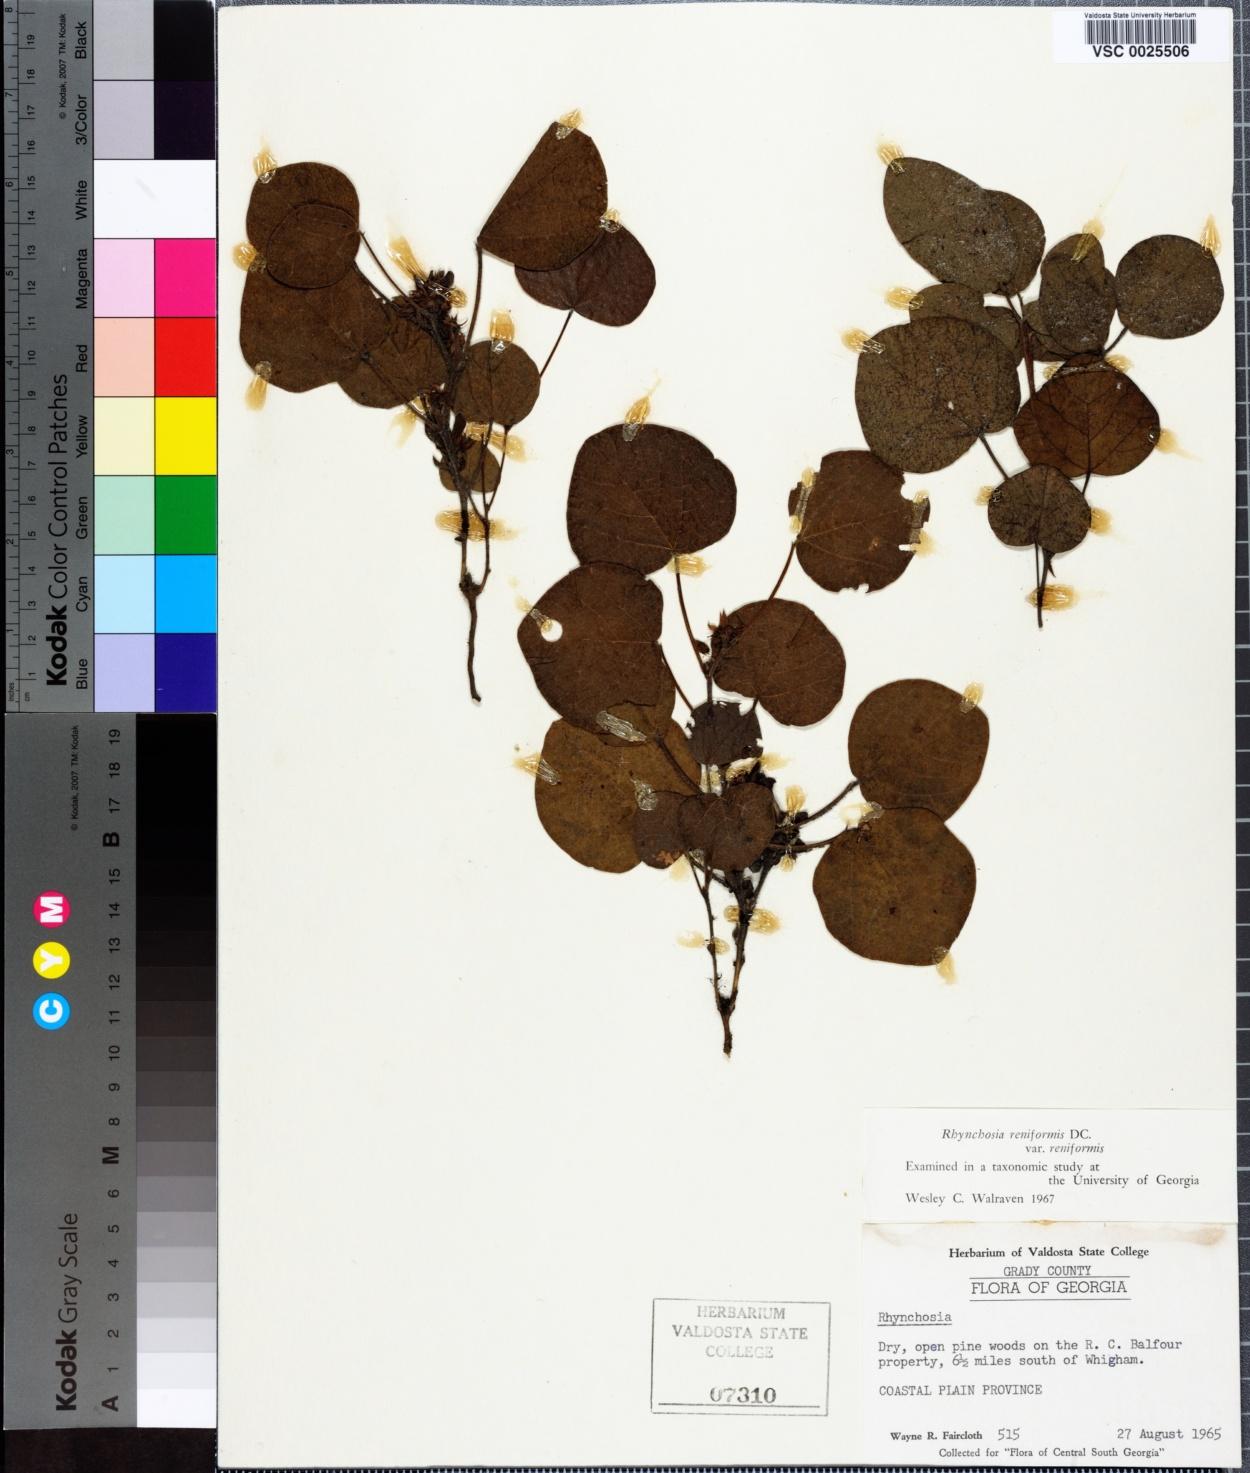 Rhynchosia reniformis image